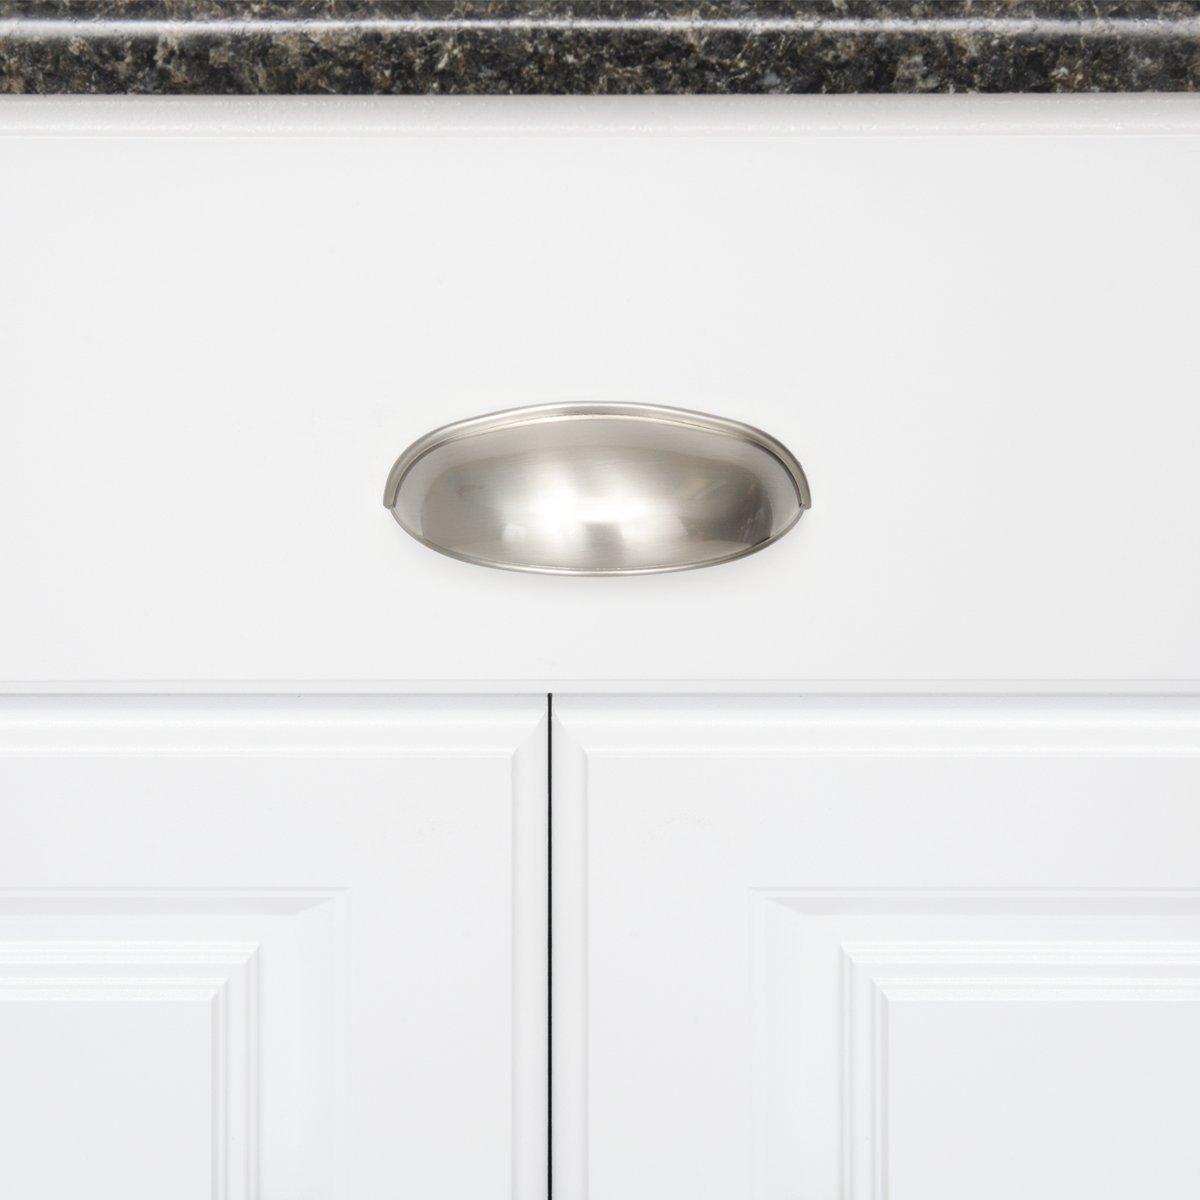 orificio central de 7,62/cm forma de tapa Basics 10,49 cm de longitud paquete de 10 plata envejecida Tirador moderno